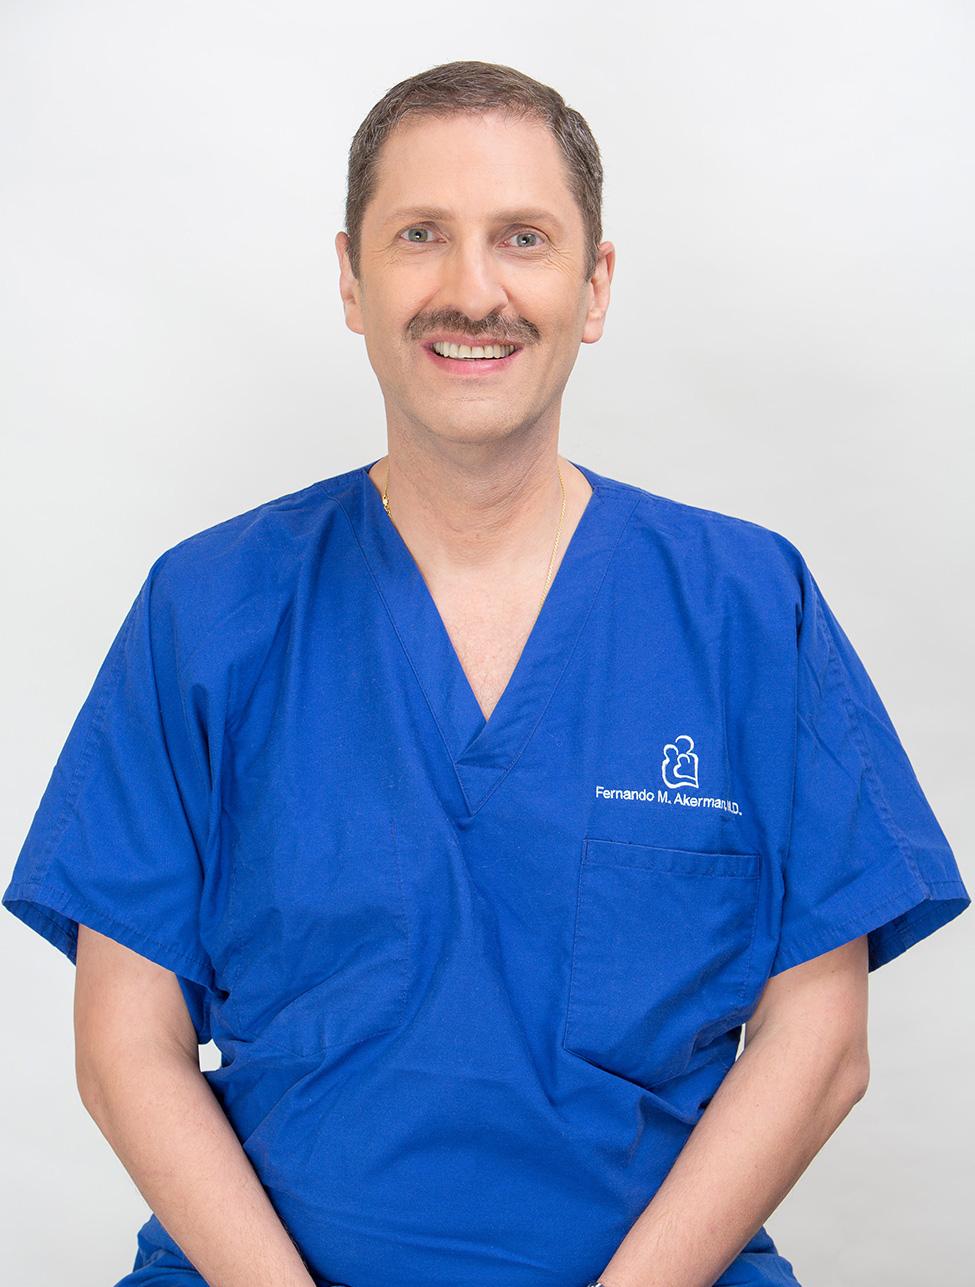 dr-akerman-resume-ambo